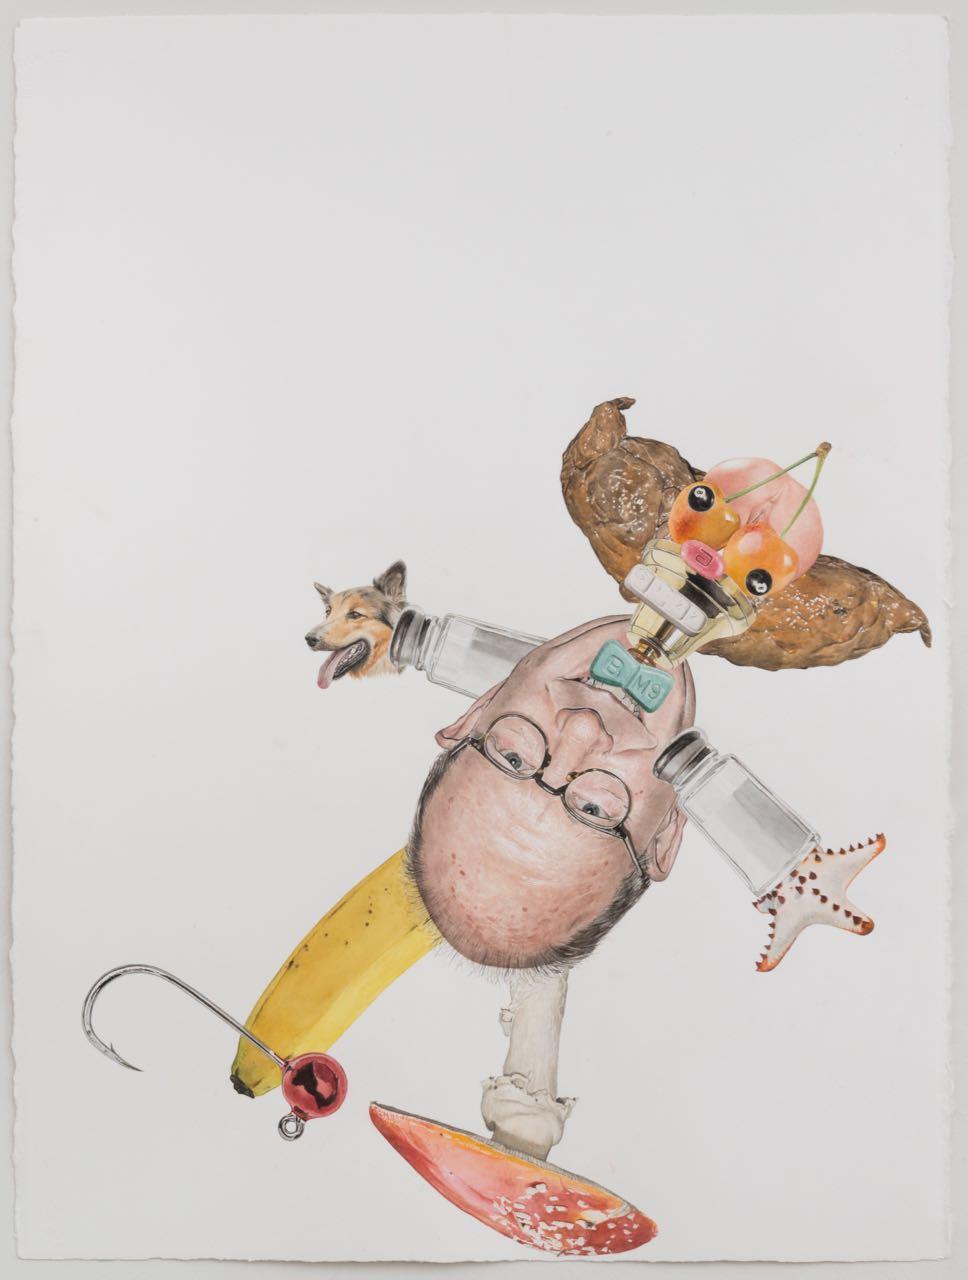 Alfred Steiner<br>Clown (Krusty)<br>32.5 x 25 in. (framed)